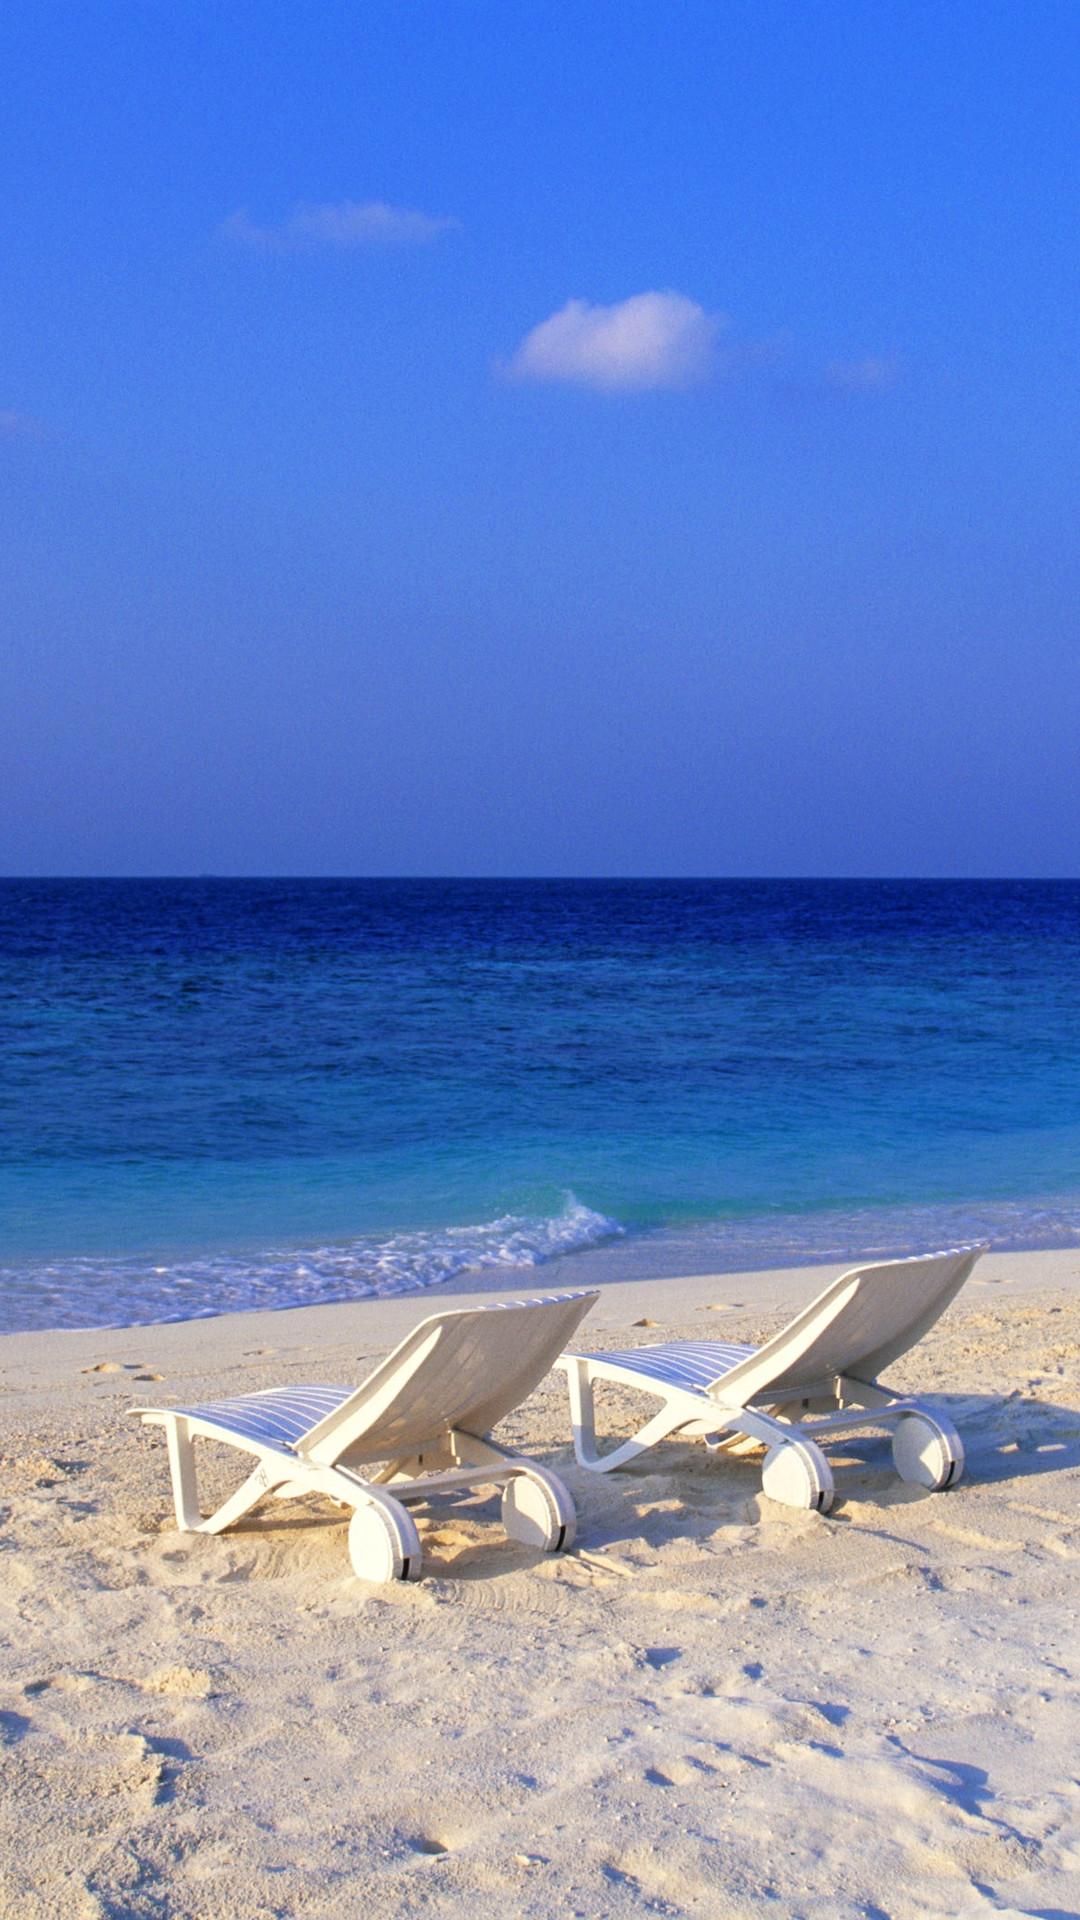 Beach View Barbados iPhone 6 Plus HD Wallpaper …